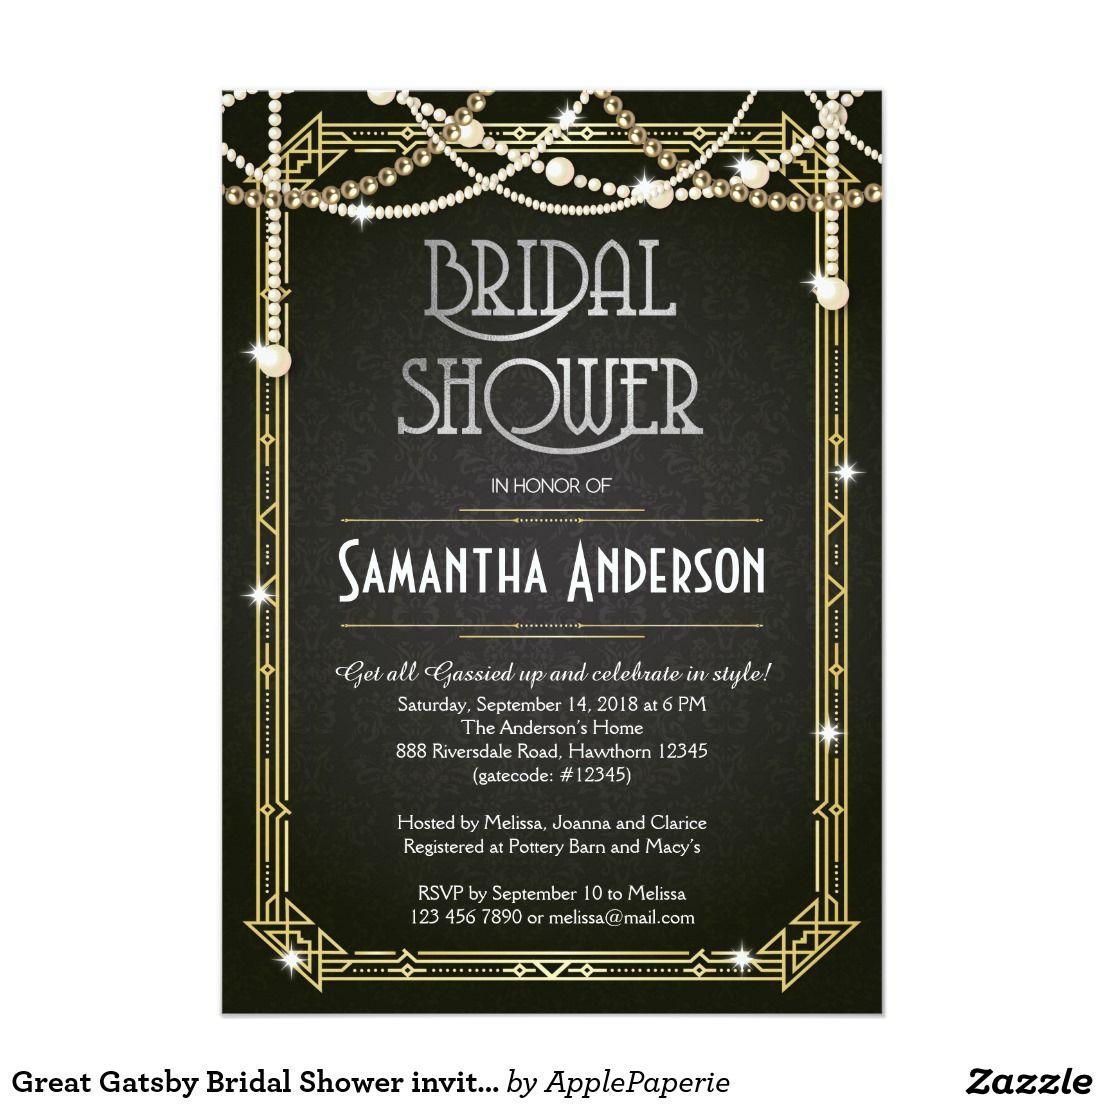 Art deco backdrop for photos wall decor party decoration 1920 s - Great Gatsby Bridal Shower Invitation Art Deco